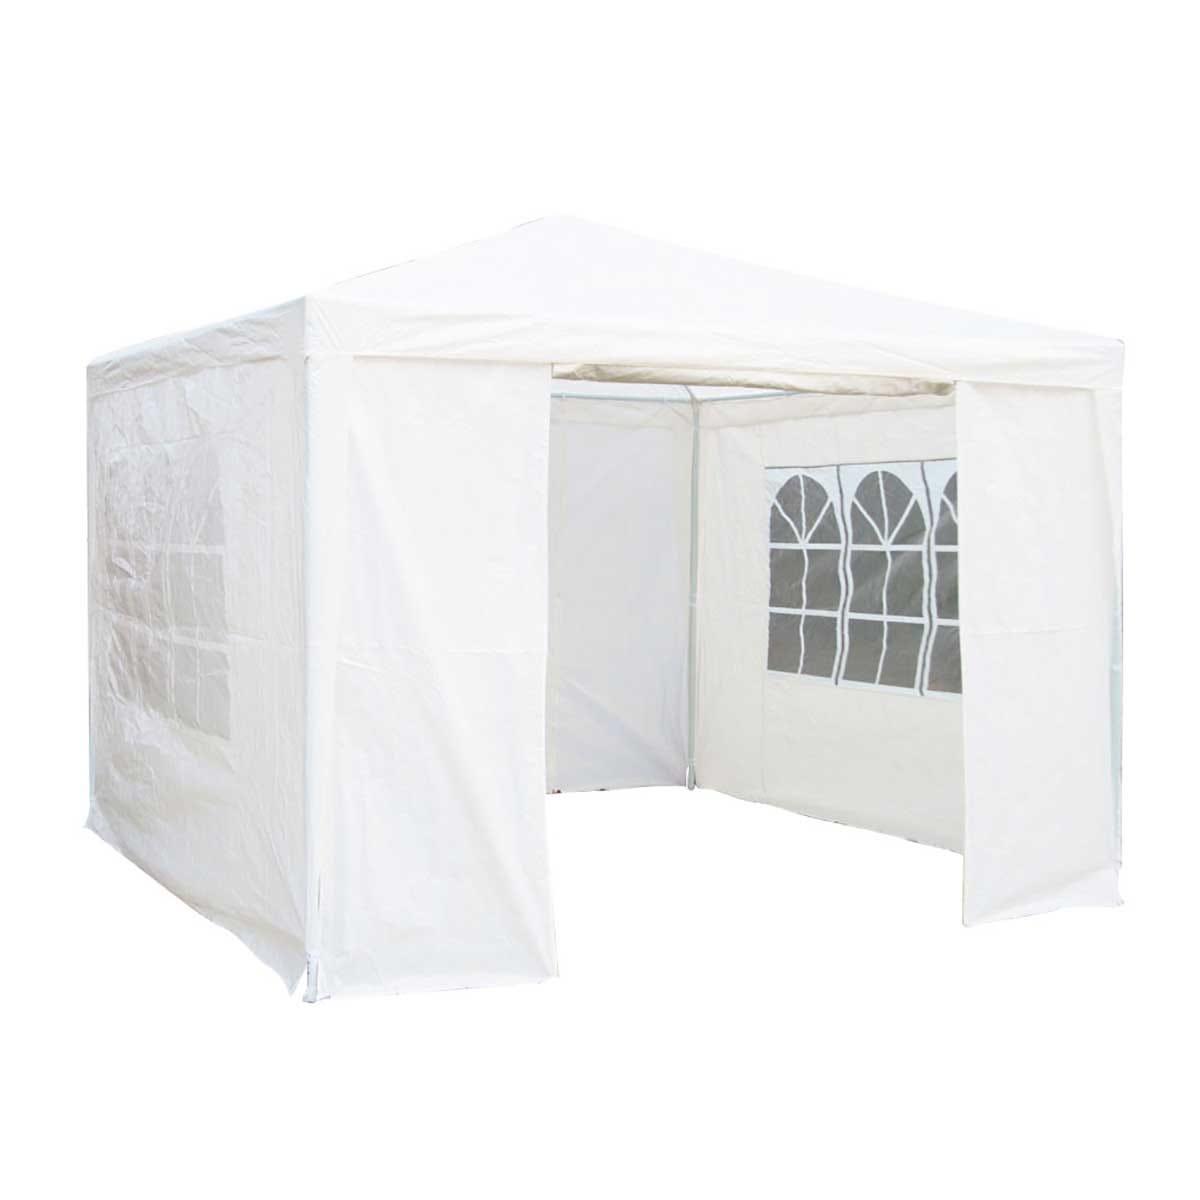 Airwave 3m x 3m Value Party Tent Gazebo - White